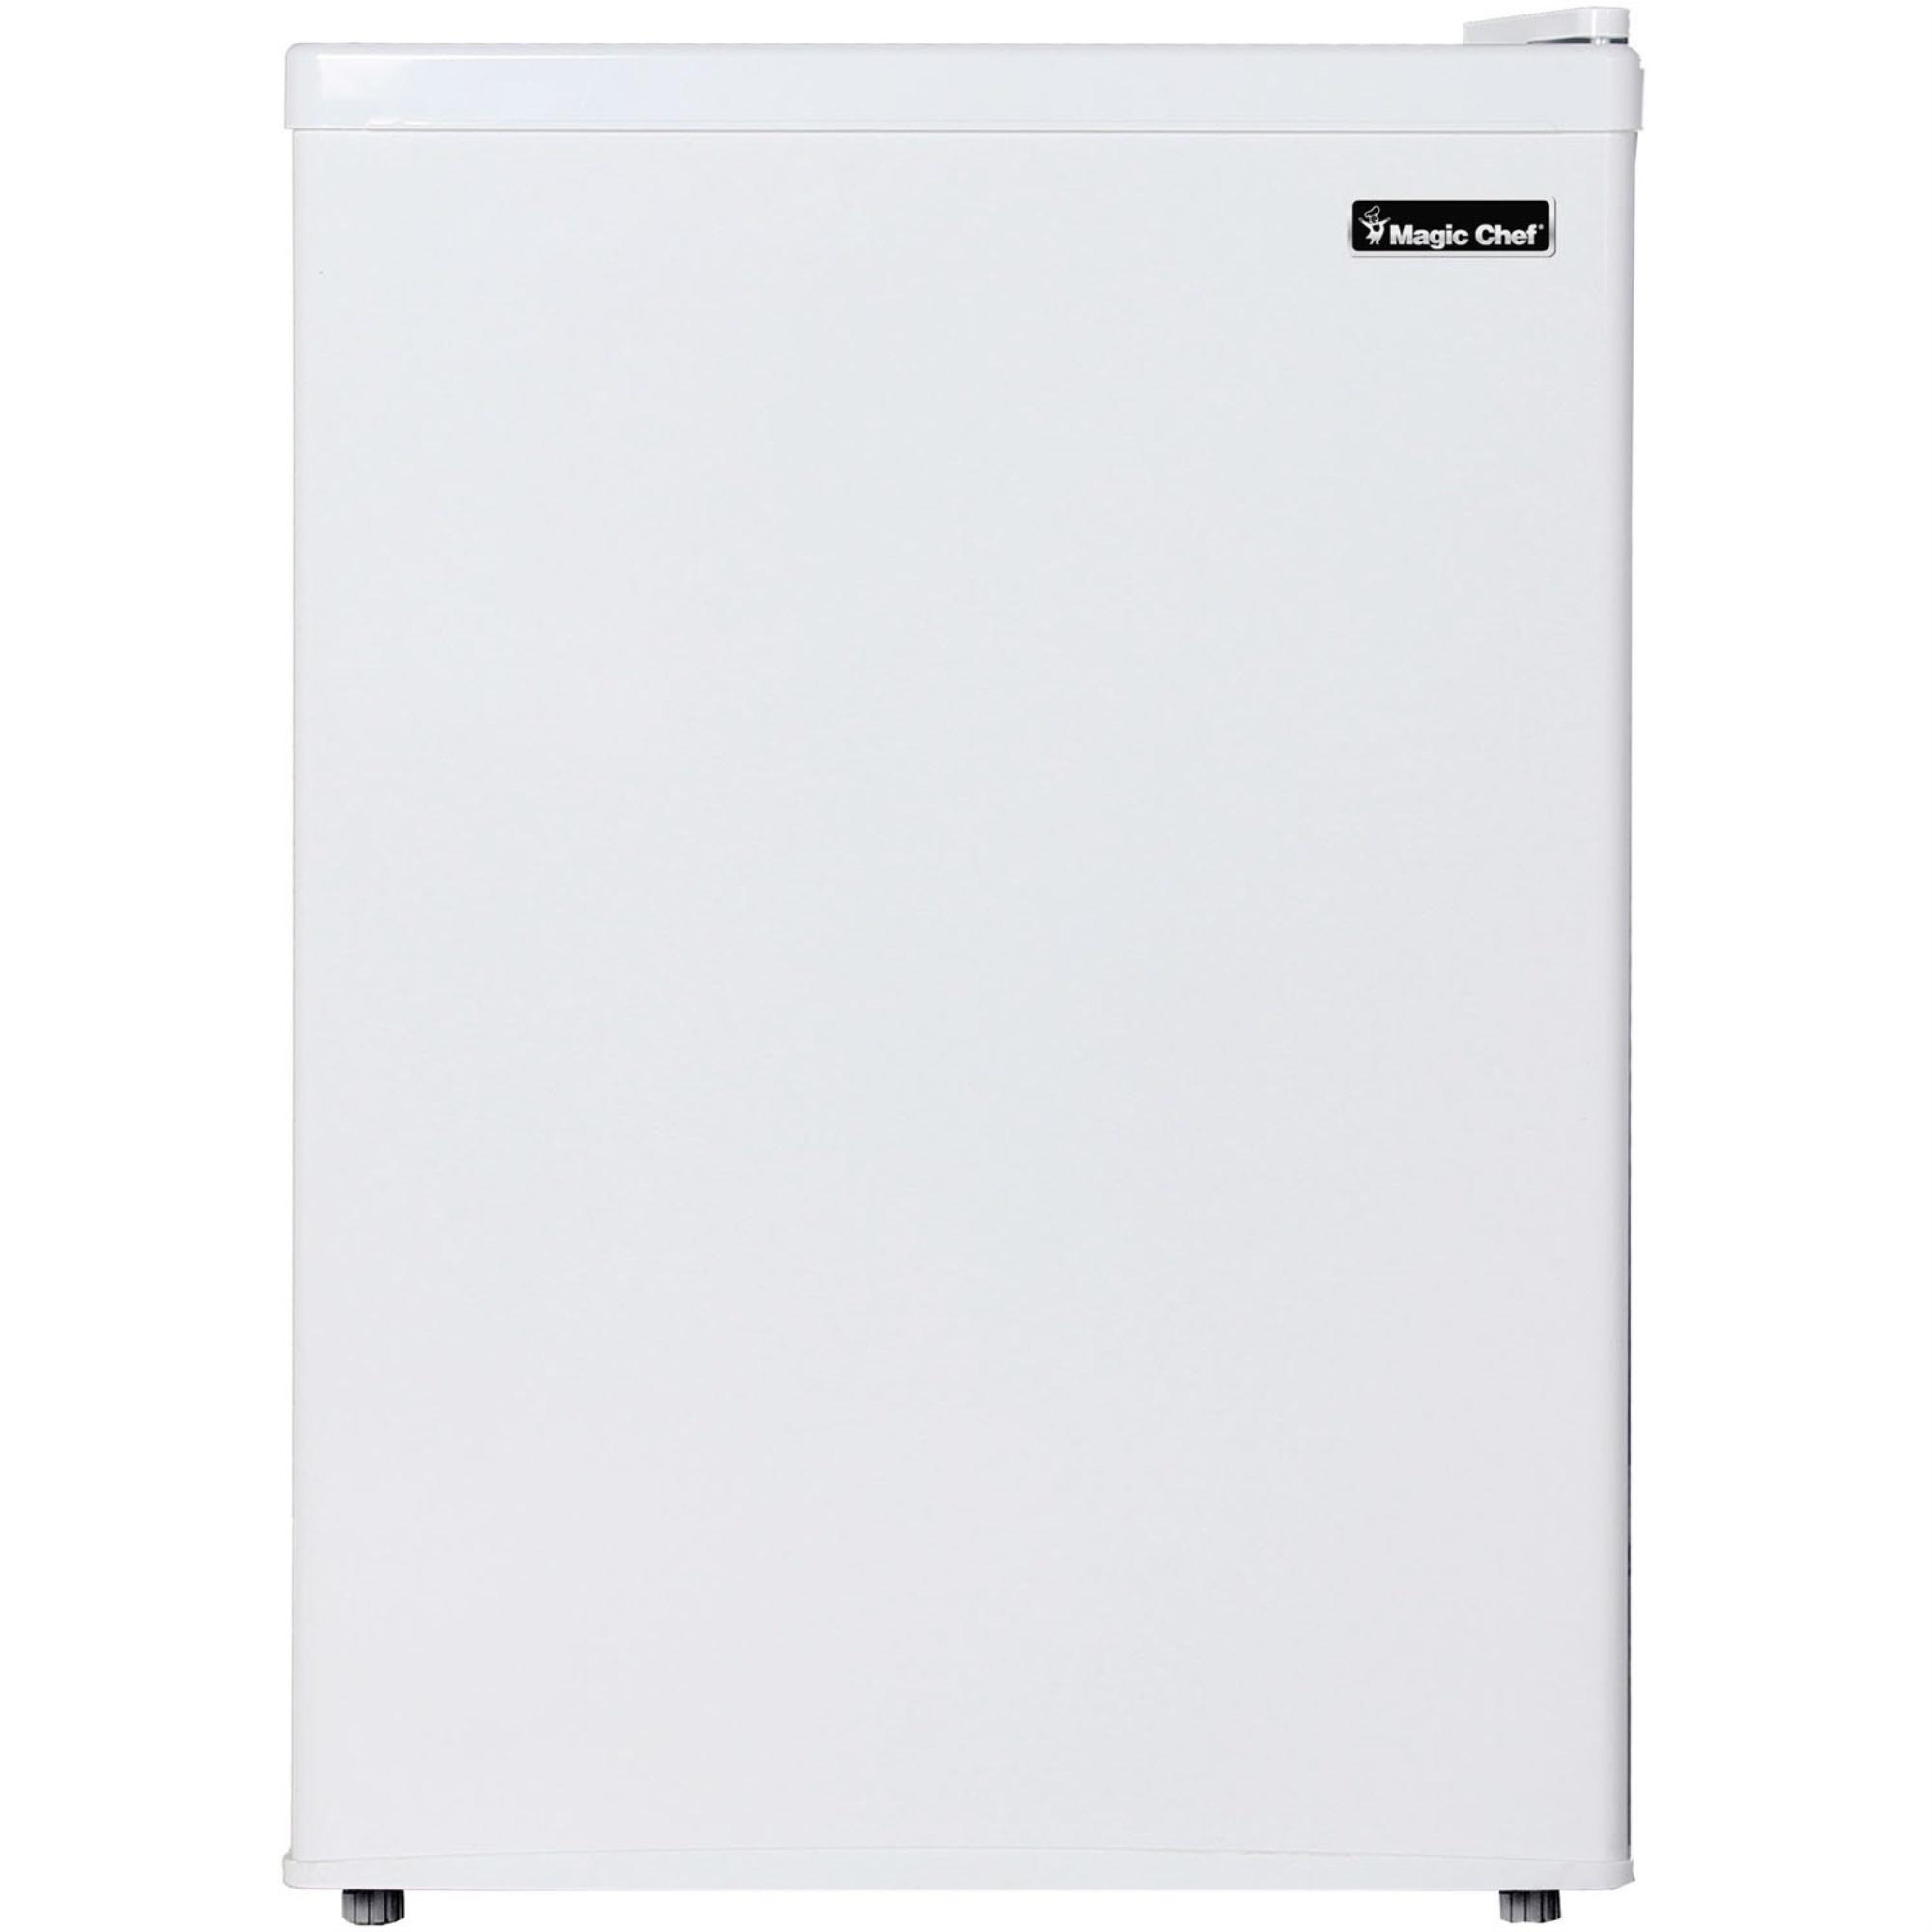 Magic Chef MCBR240W1 2.4 Cu. Ft. Mini Refrigerator with Half